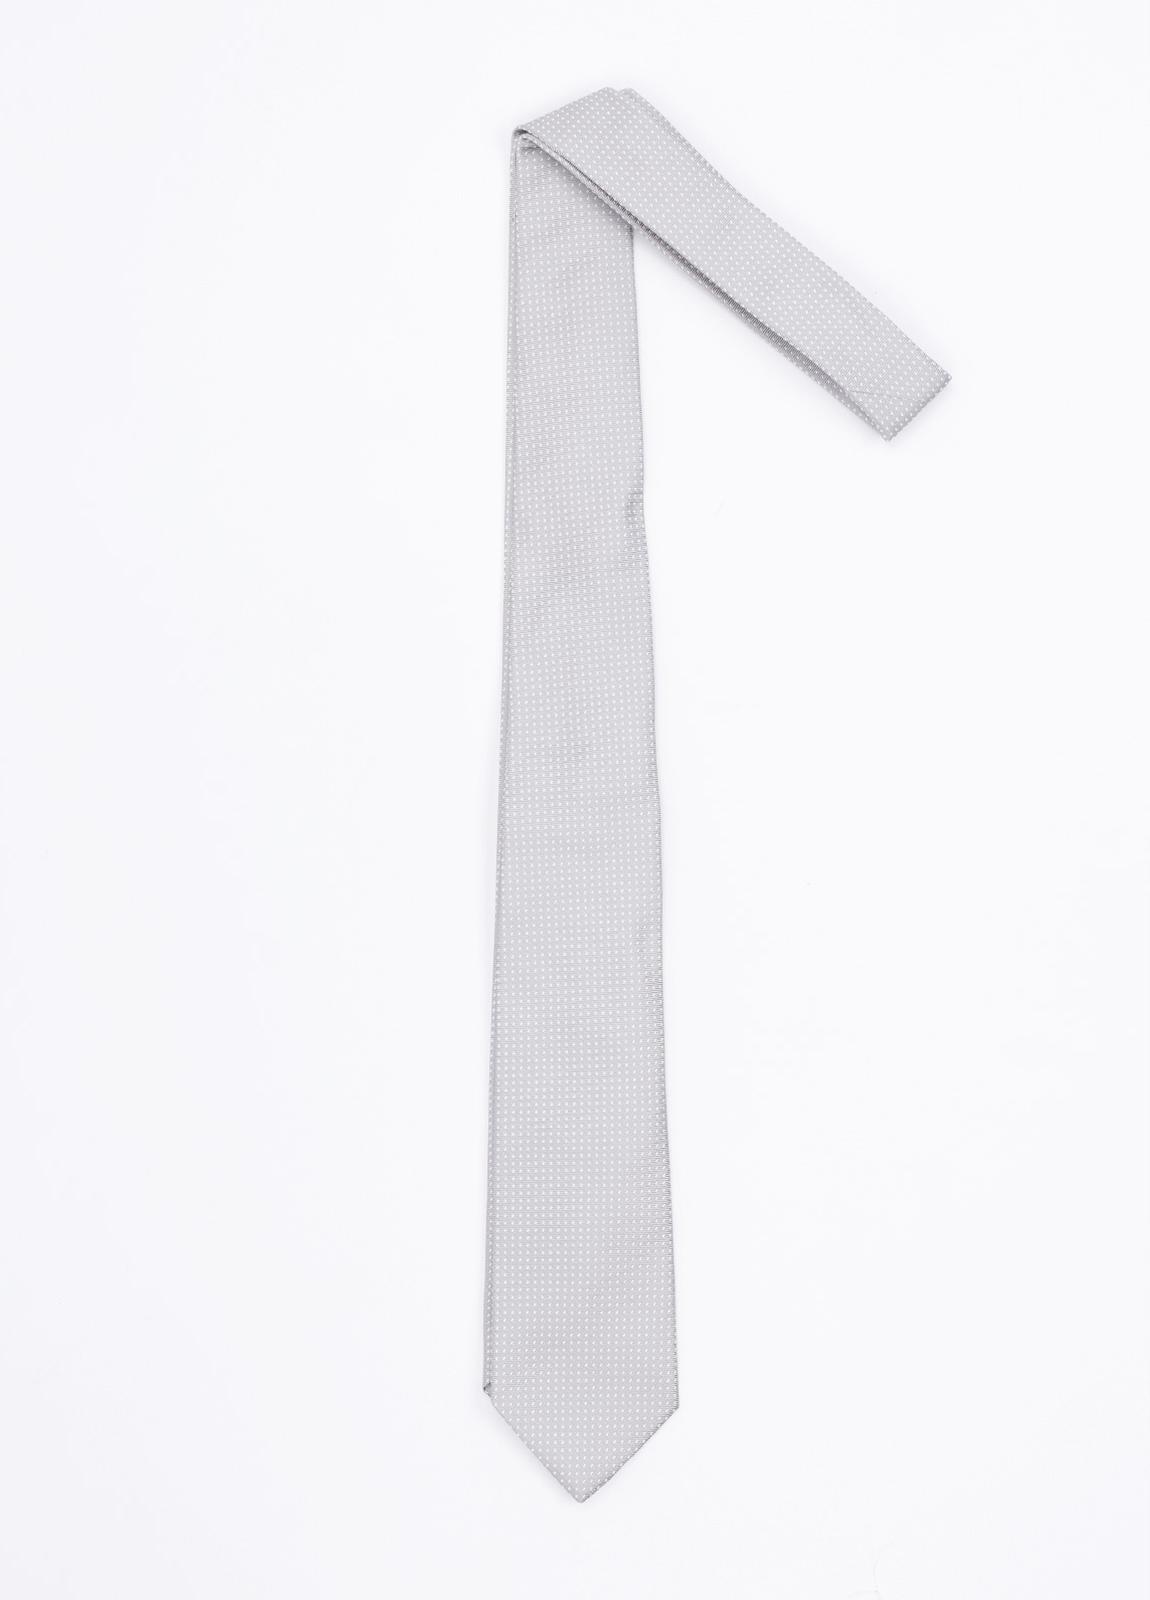 Corbata ceremonia microdibujo, color perla. Pala 7,5 cm. 100% Seda.